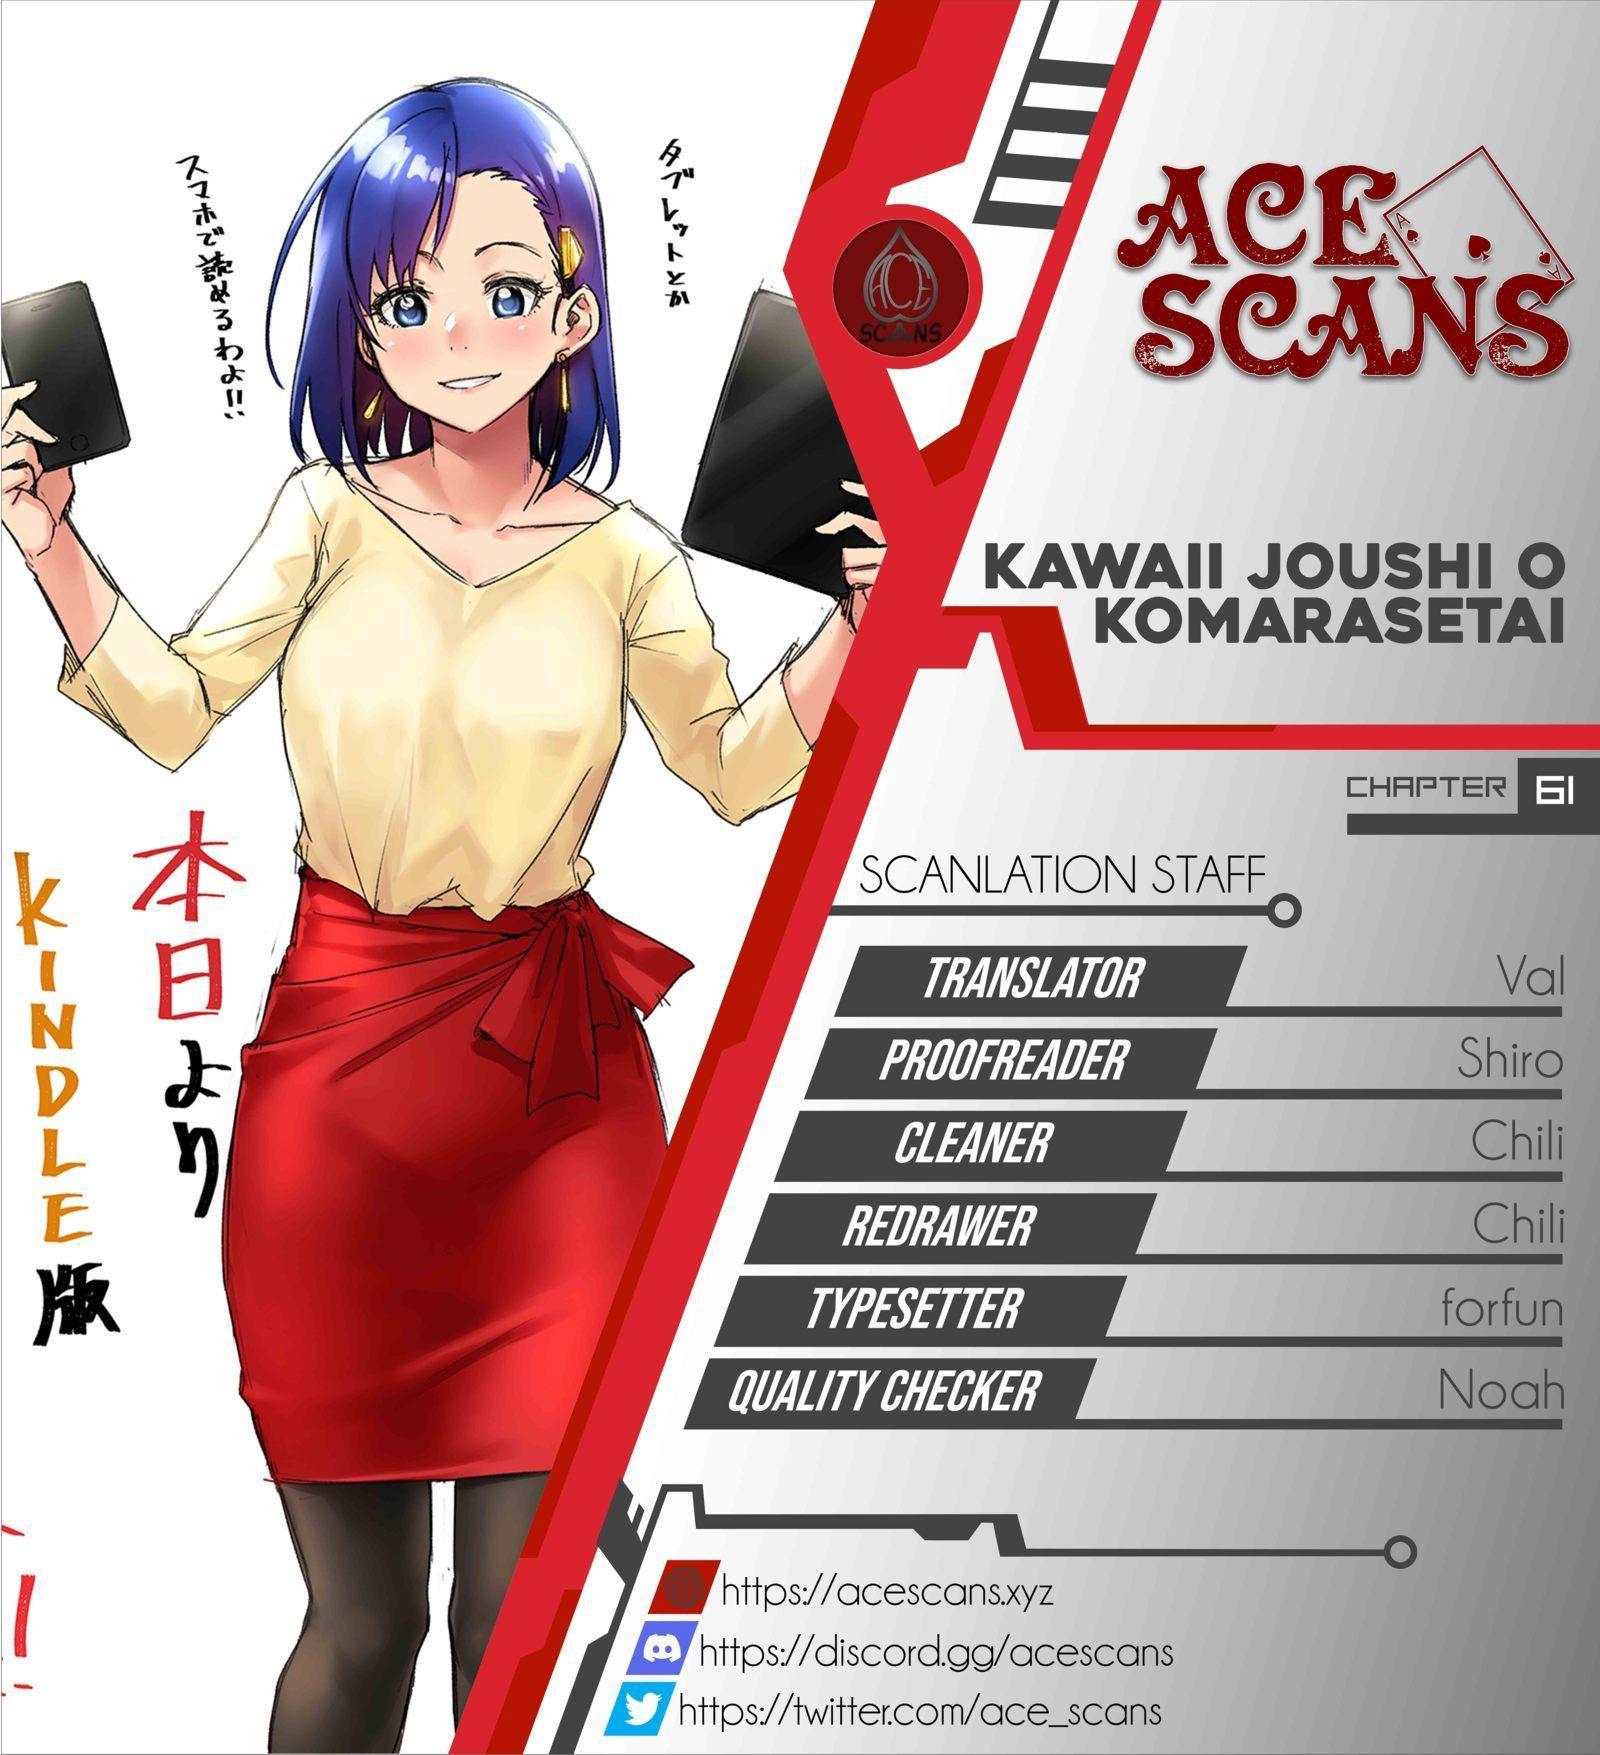 Kawaii Joushi O Komarasetai Chapter 61 page 1 - Mangakakalots.com